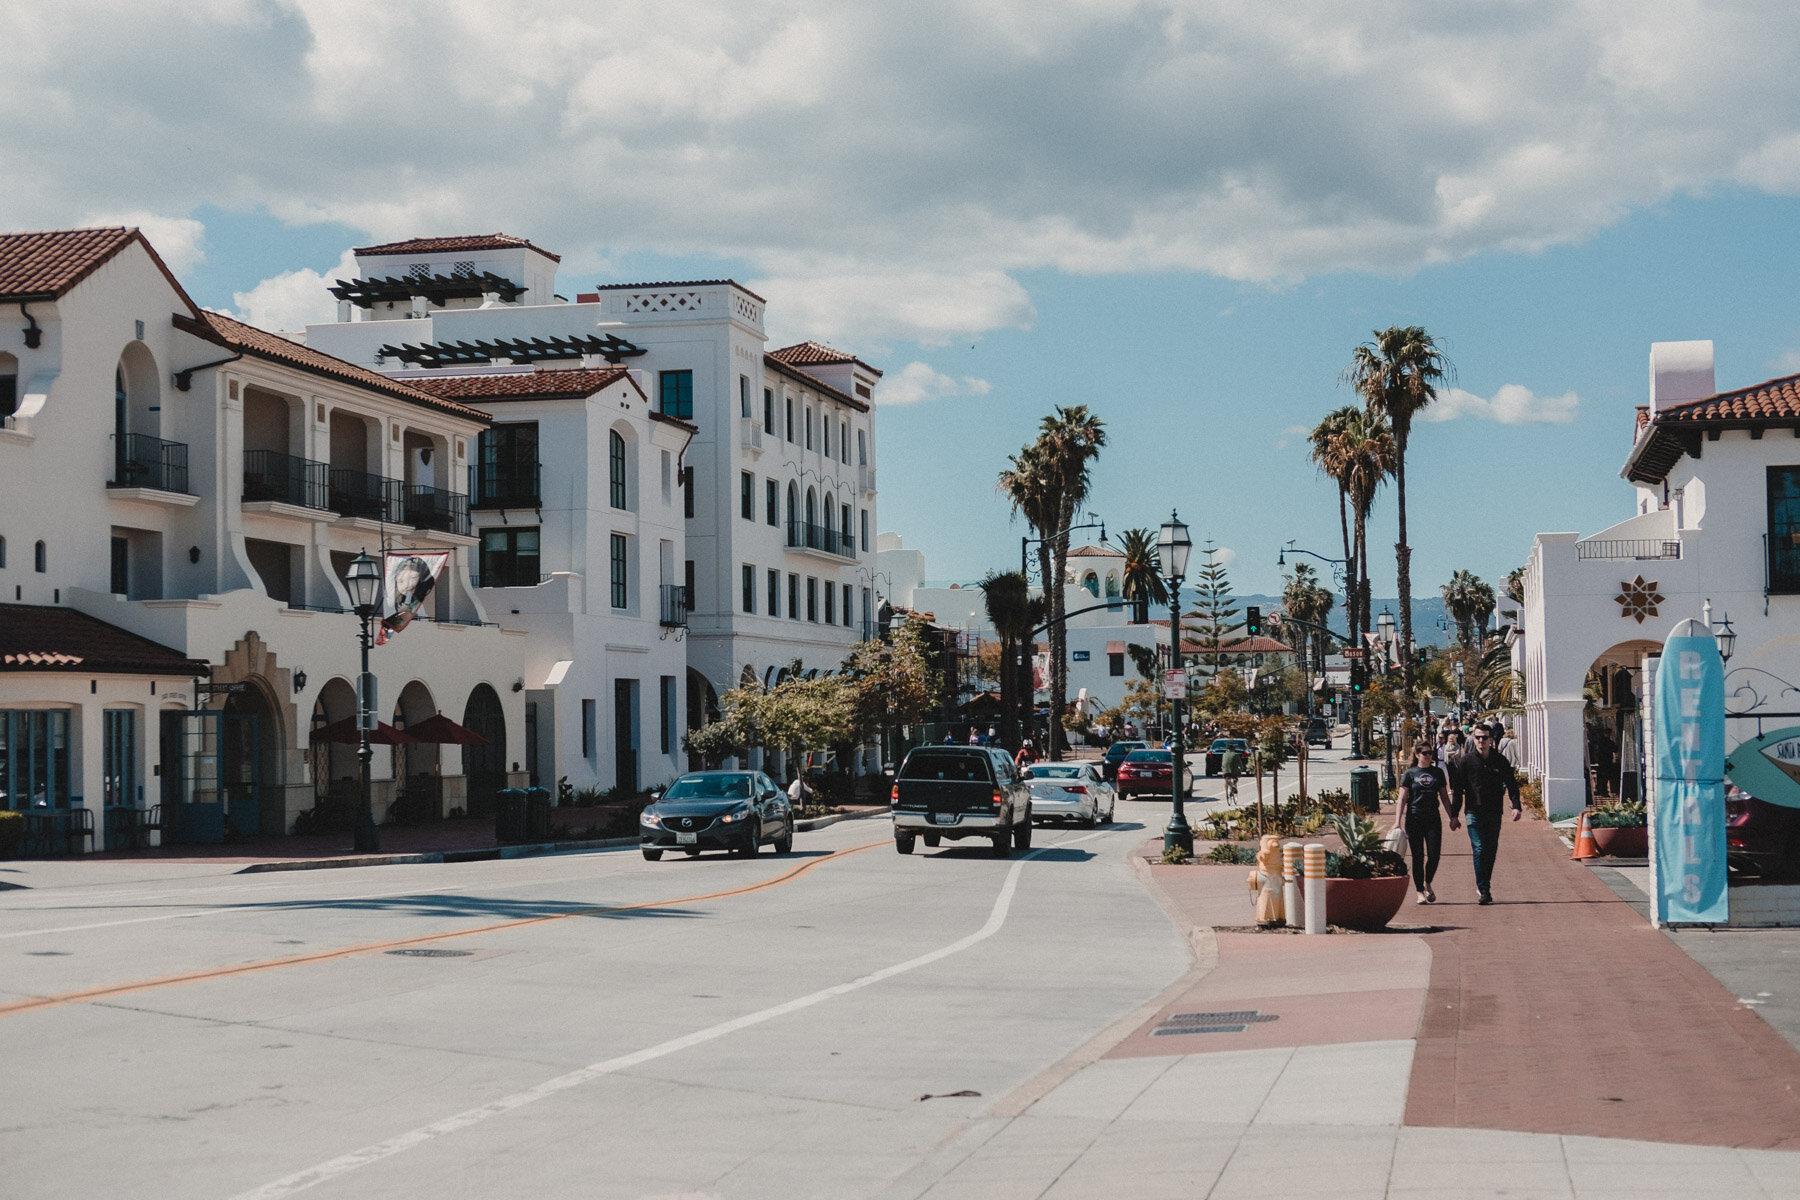 Rachel Off Duty: Downtown Santa Barbara, California